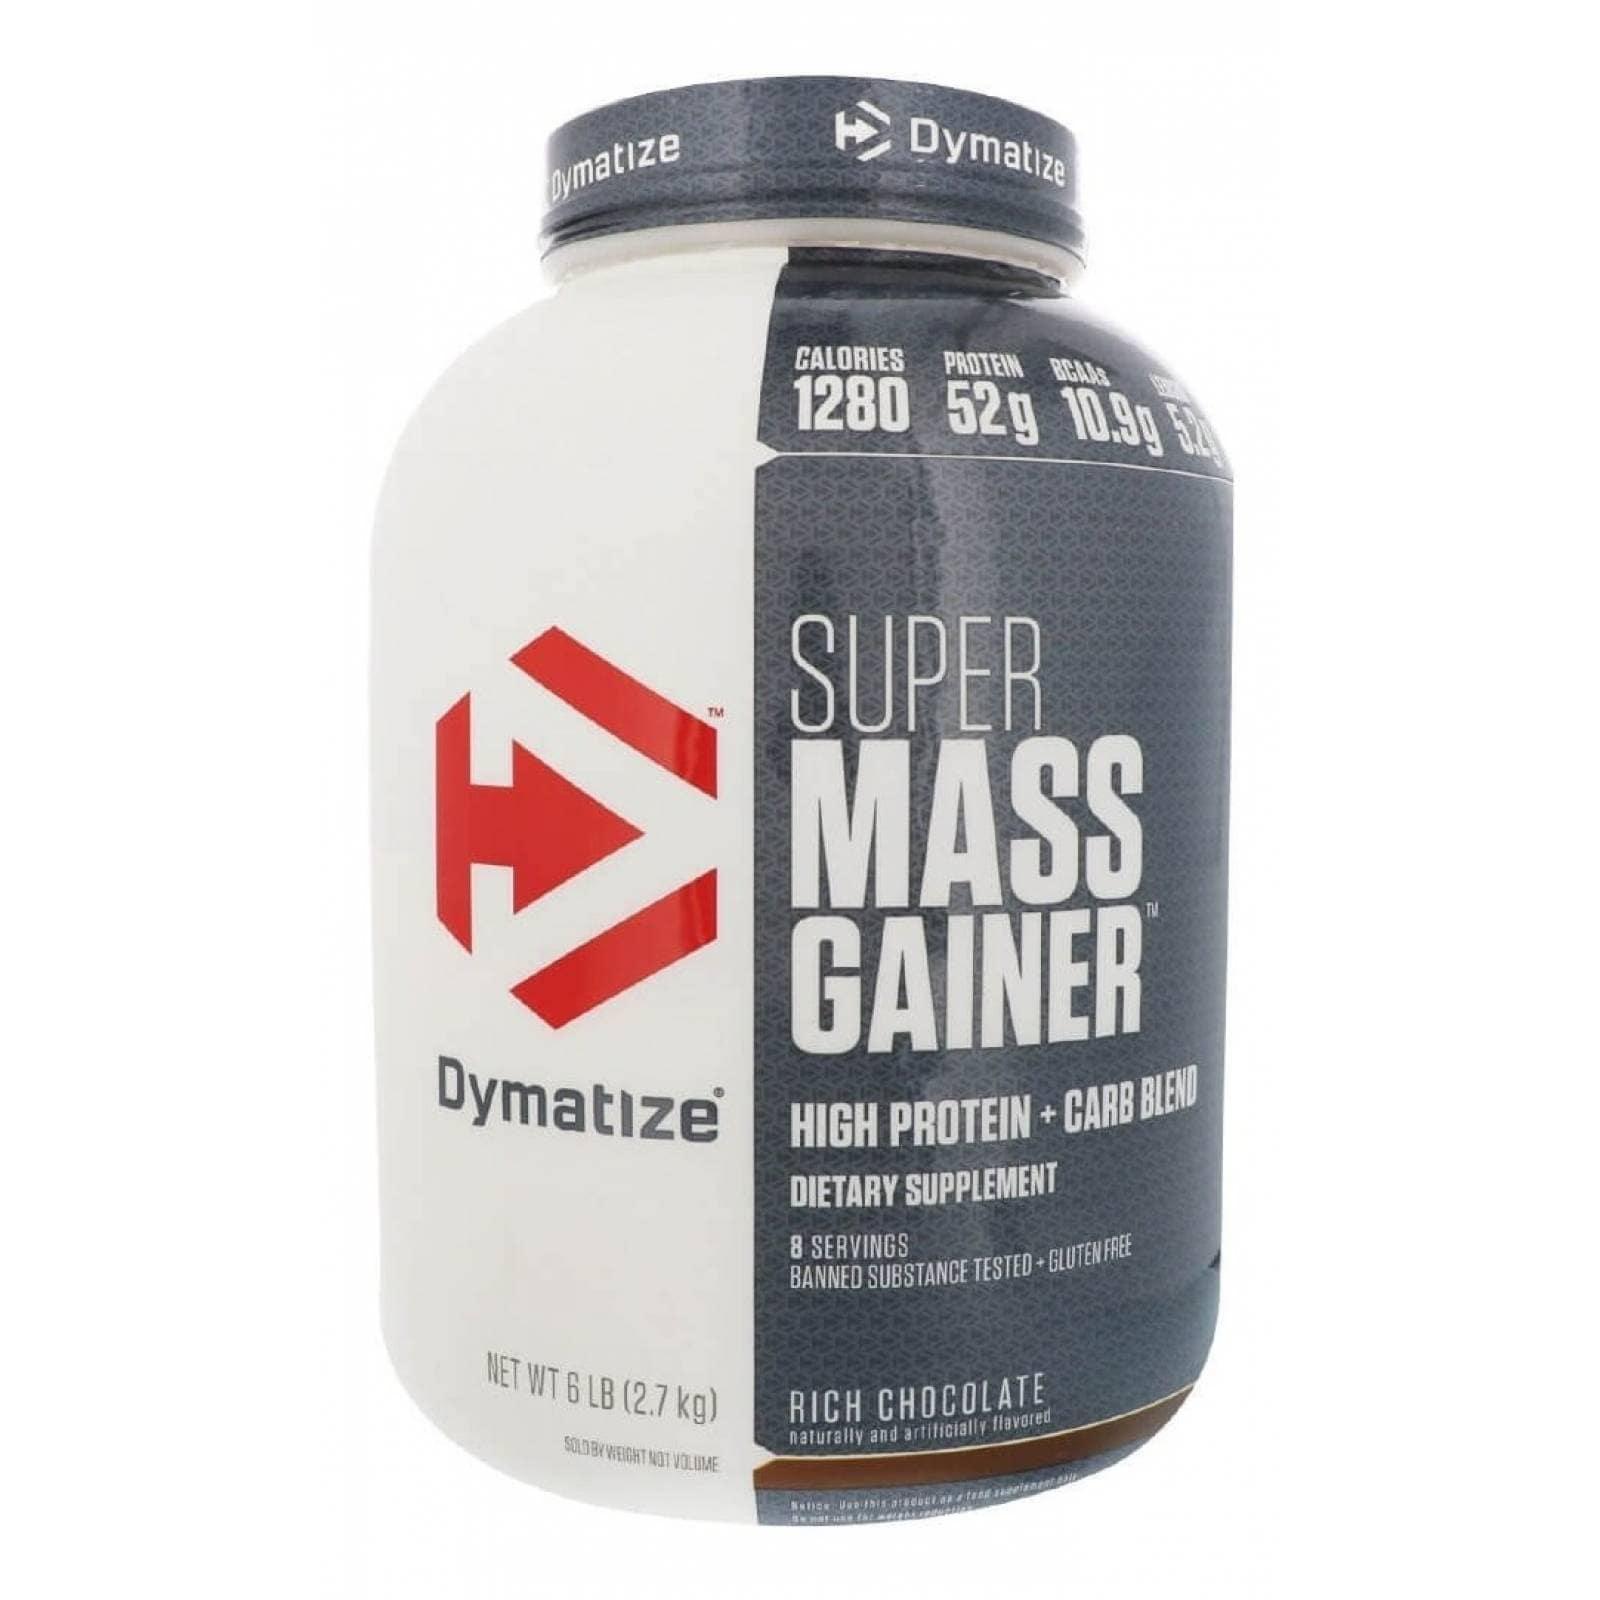 DYM SUPER MASS GAINER 6 LBS CHOCOLATE